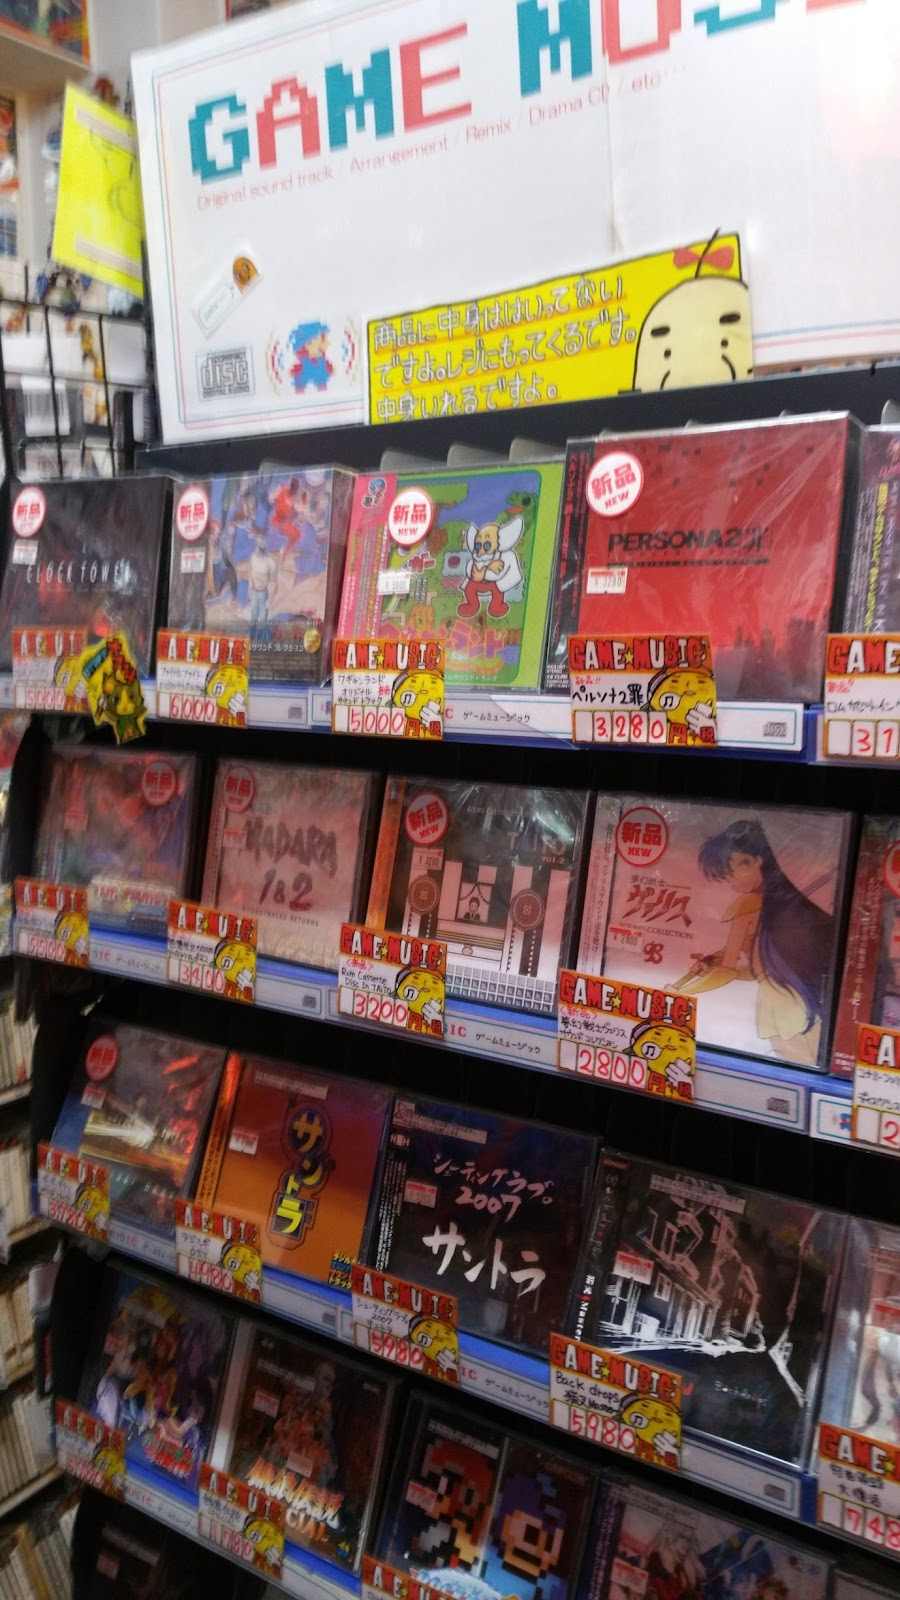 C:\Users\J\Pictures\TOKYO NOV 2016\SUPER POTATO\20161117_160425.jpg